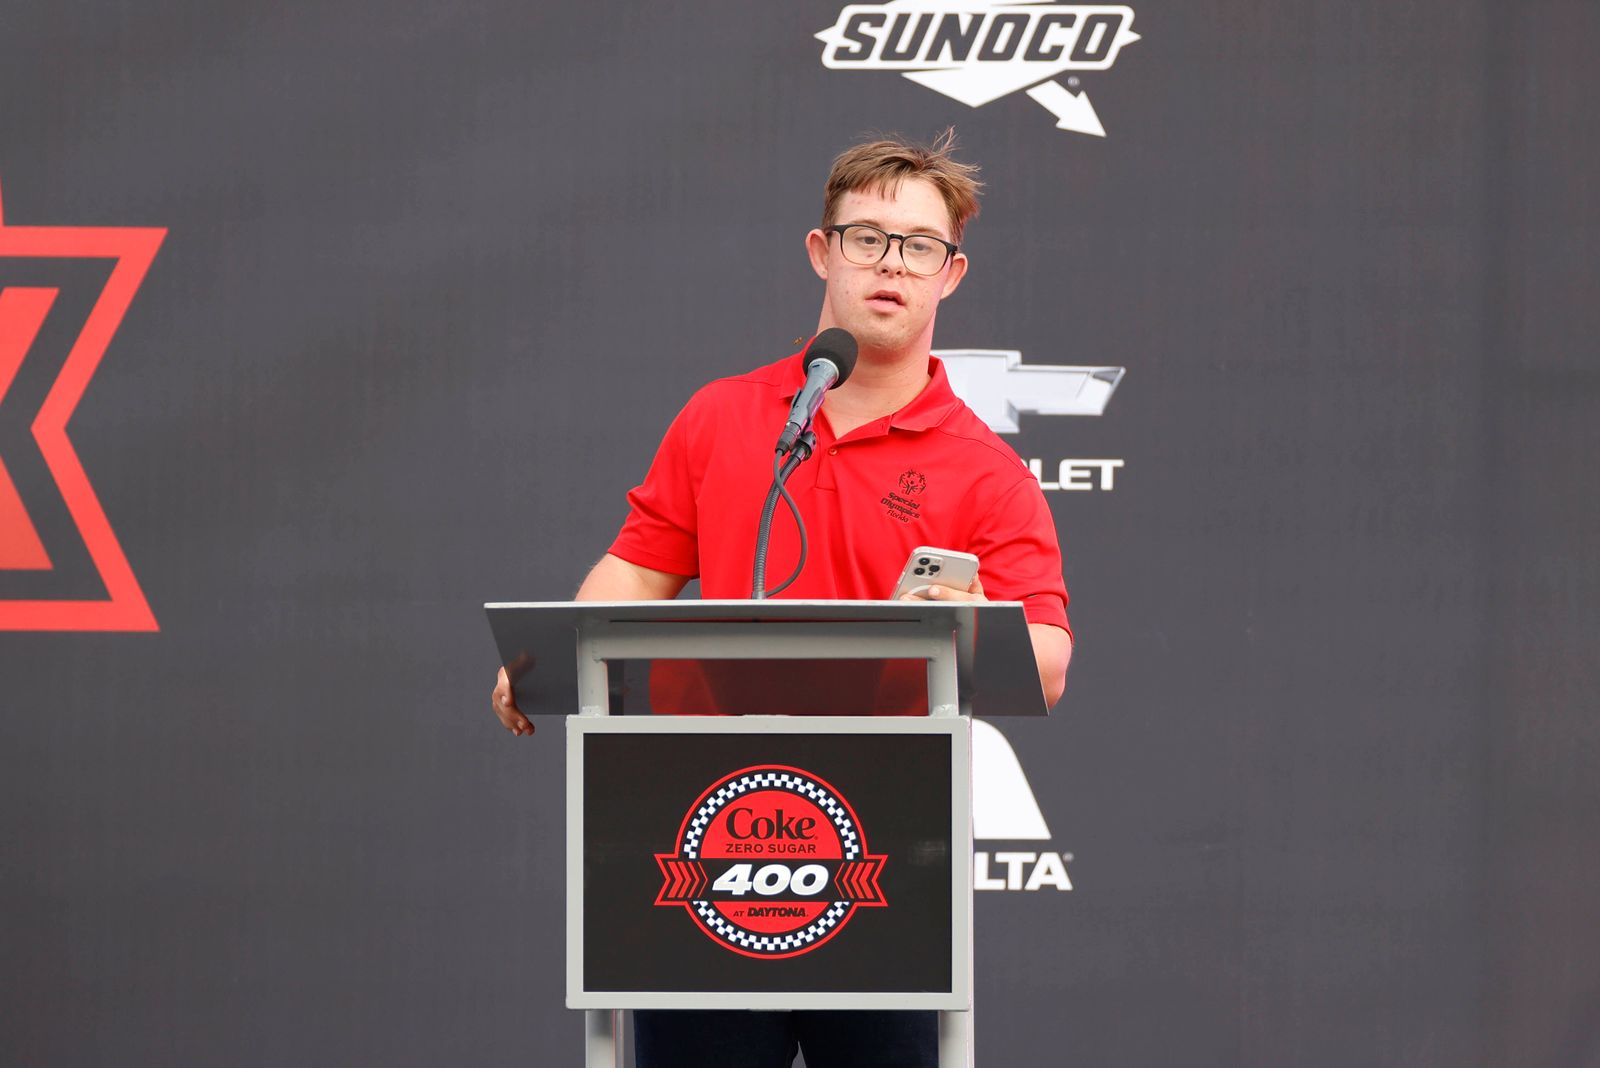 DAYTONA, FL - AUGUST 28: Chris Nikic speaks to the crowd before the Coke Zero Sugar 400 on August 28, 2021 at Daytona In